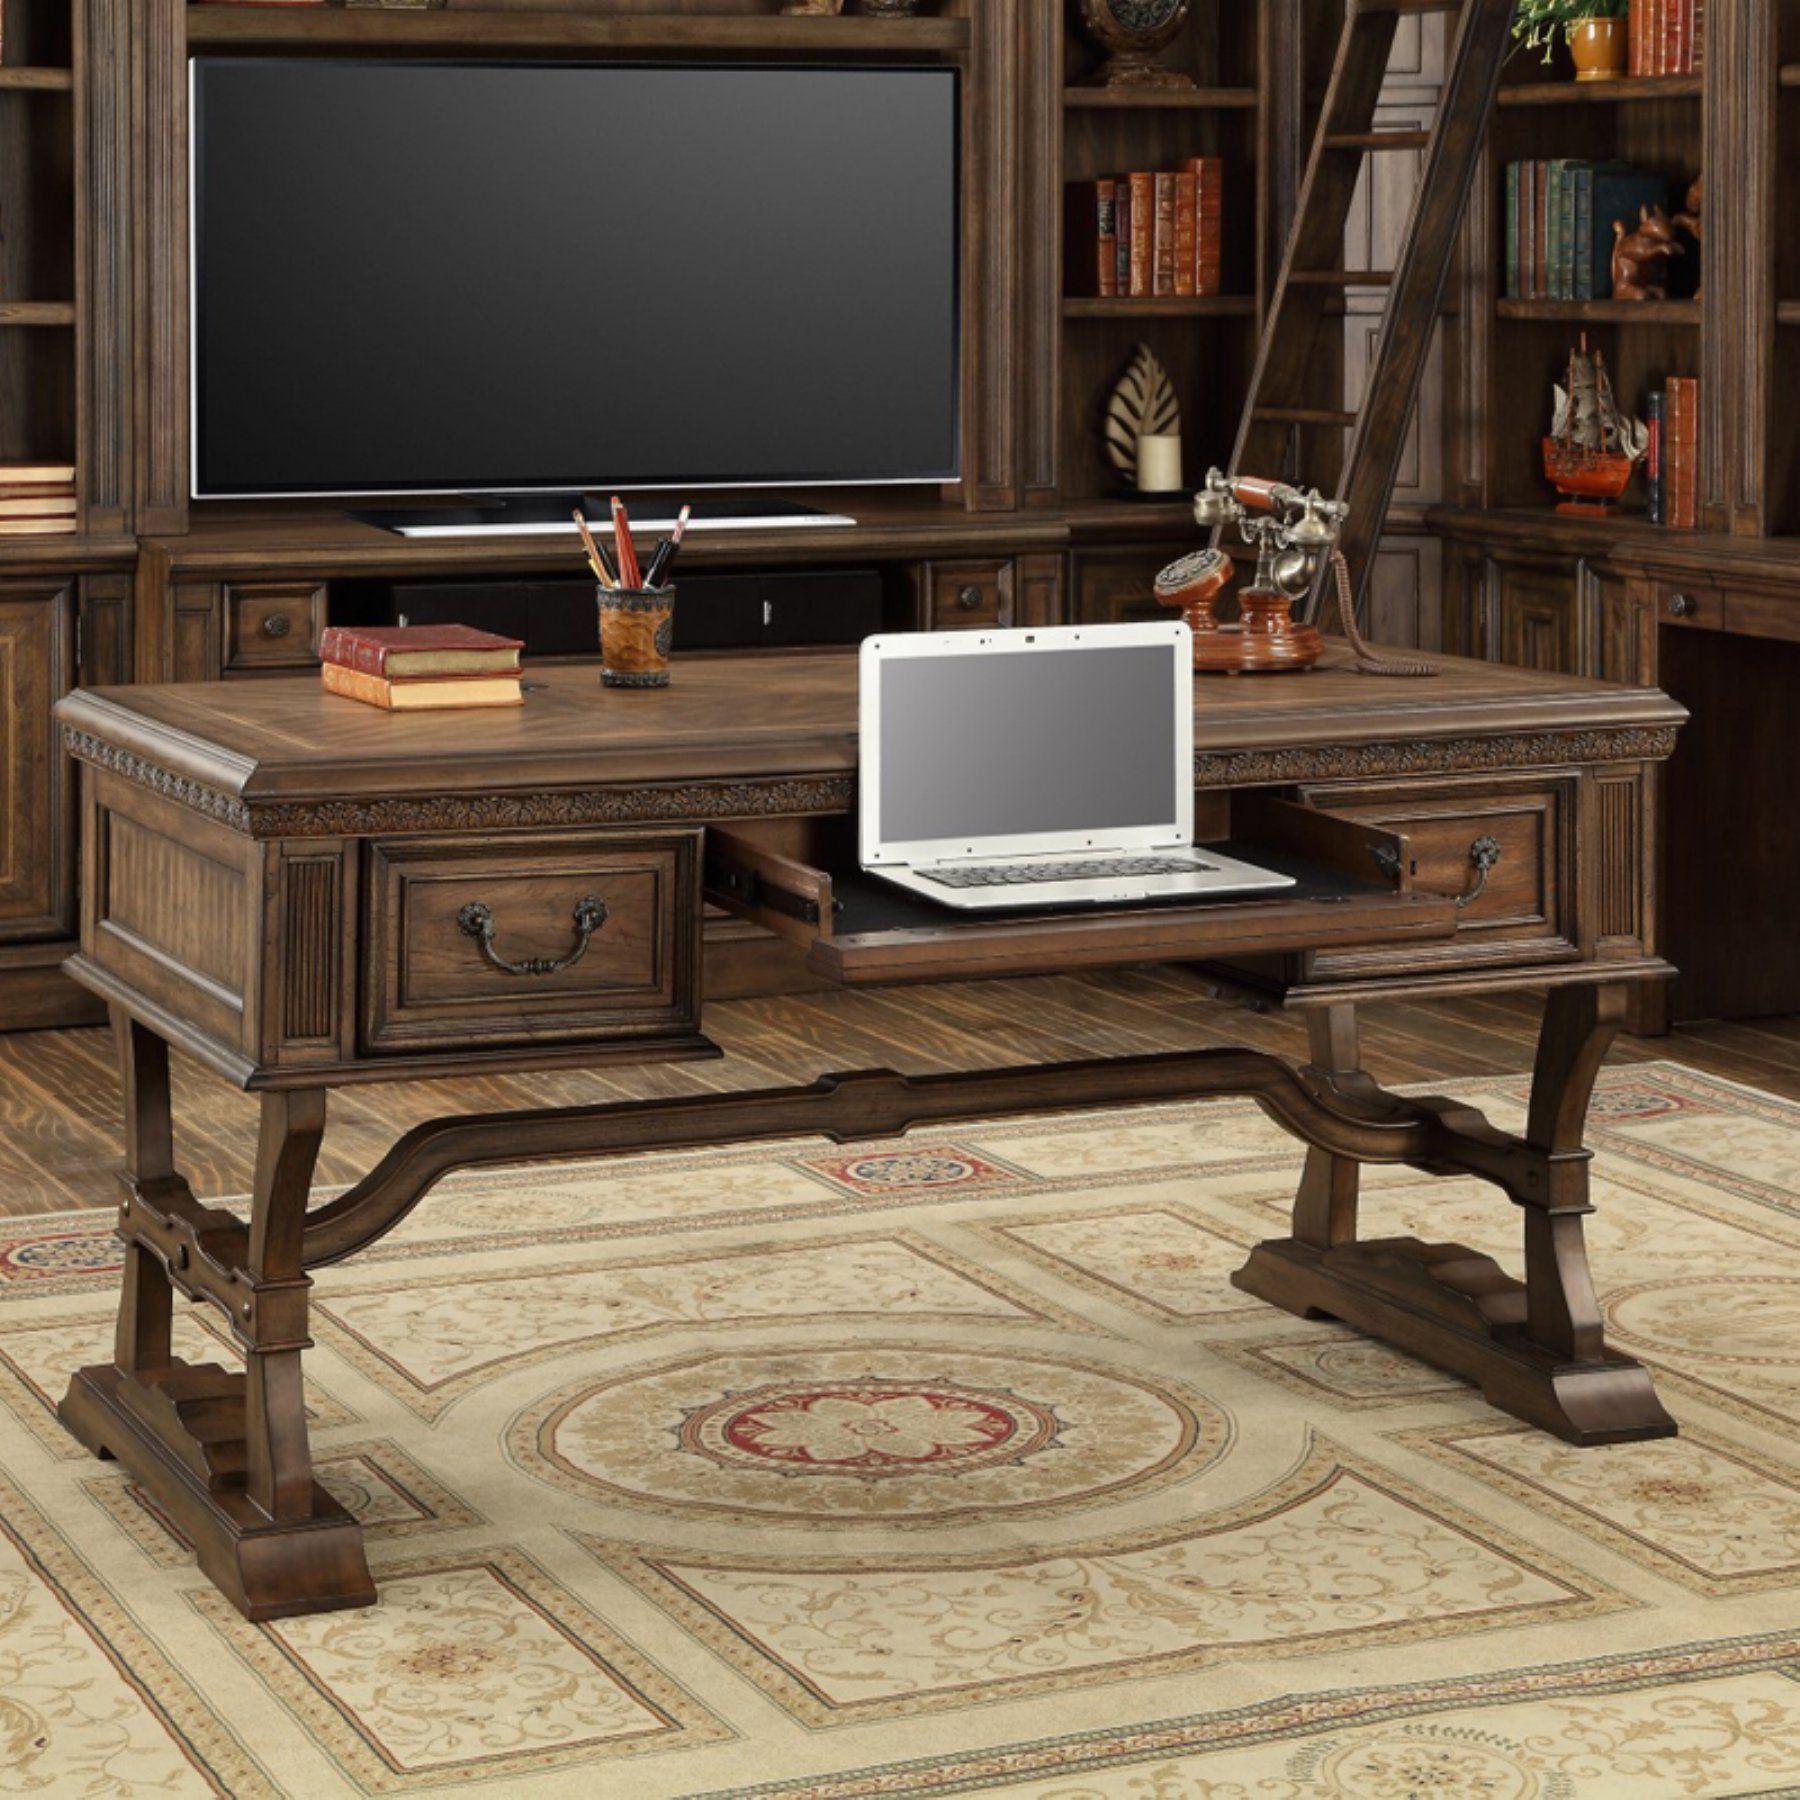 Parker house aria library writing desk antique vintage smoked pecan ari485